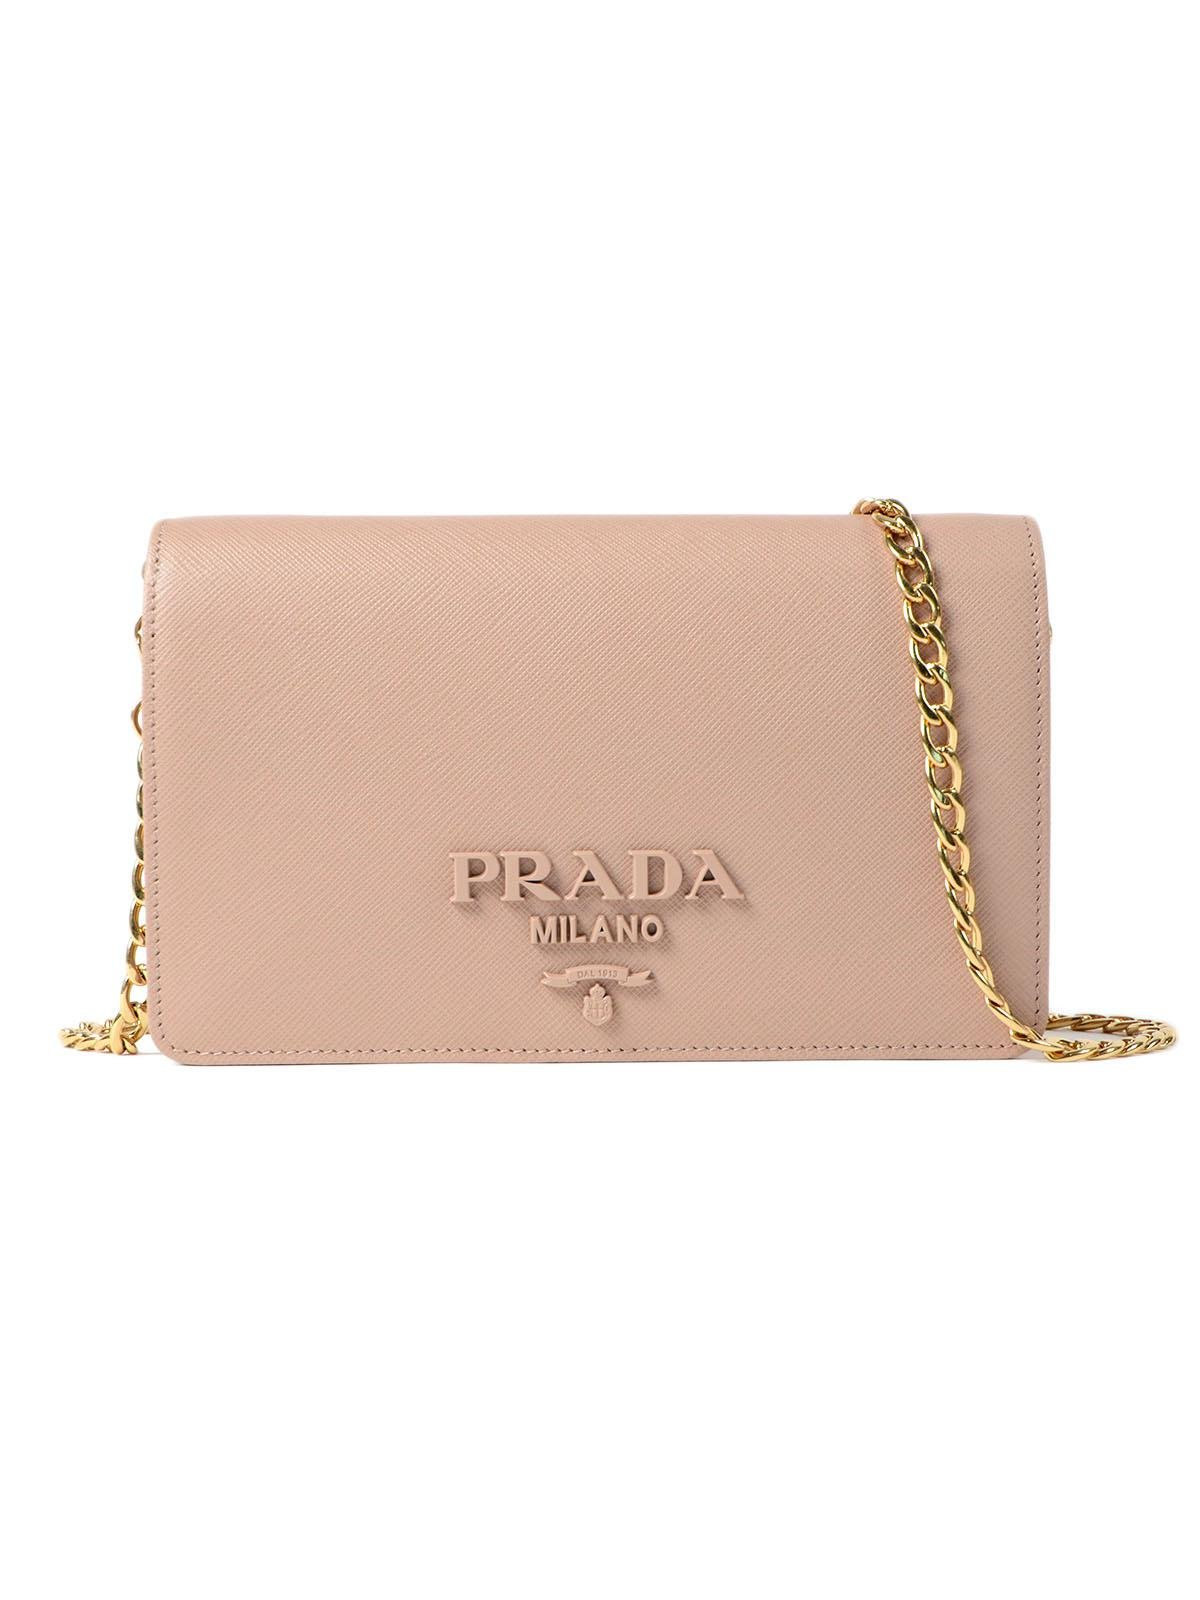 b9a0aad10e03 Prada Wallet Bag - Best Photo Wallet Justiceforkenny.Org